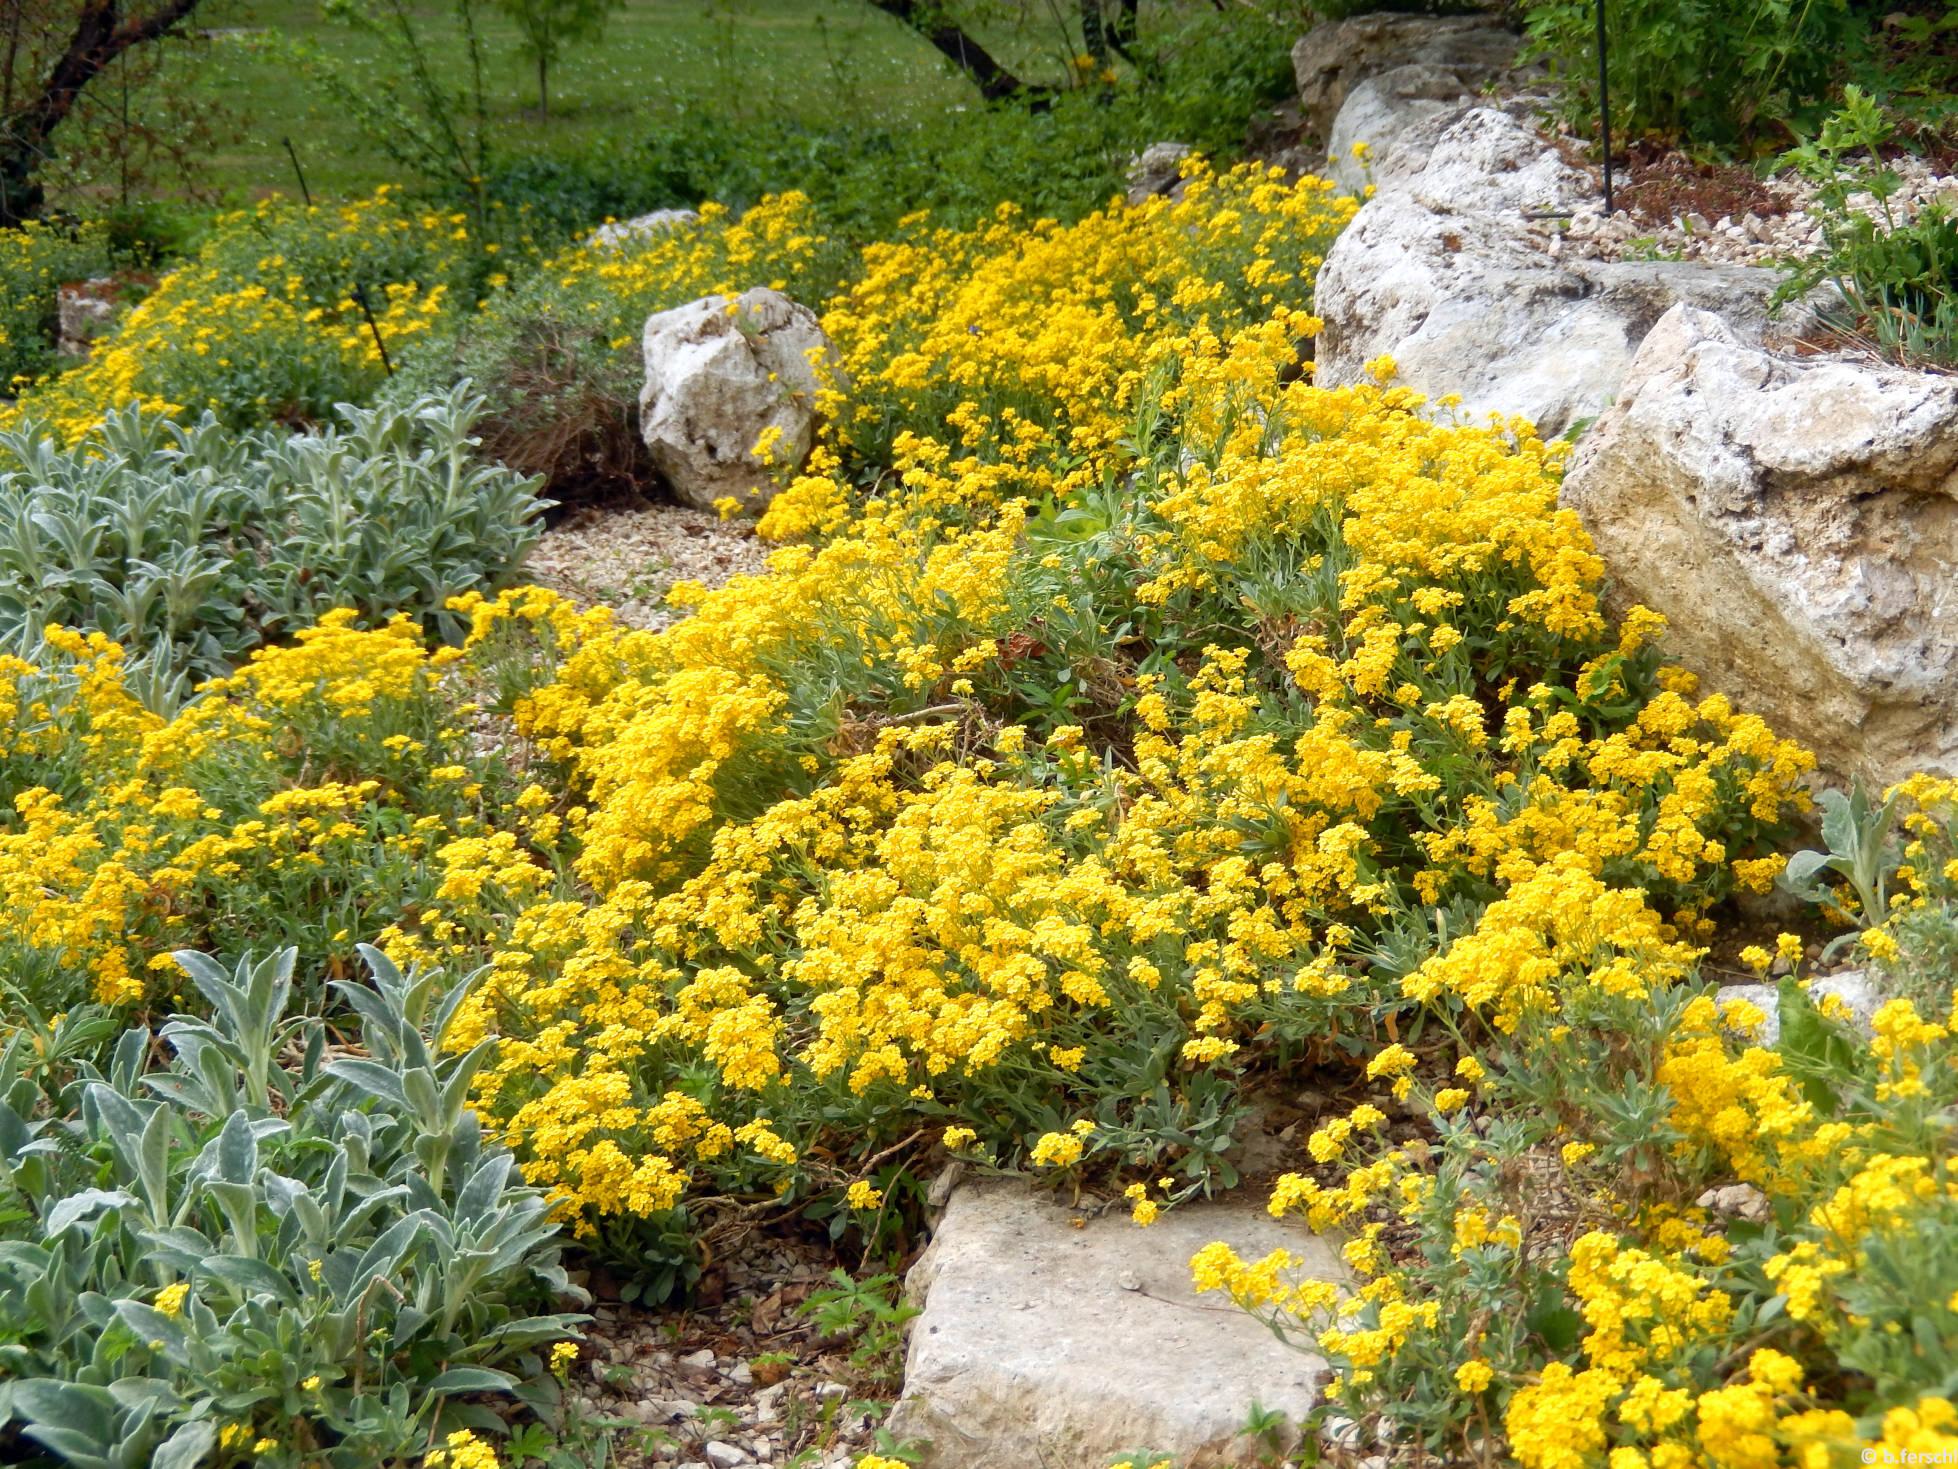 Sziklai ternye (Aurinia saxatilis) az alsó sziklakerben